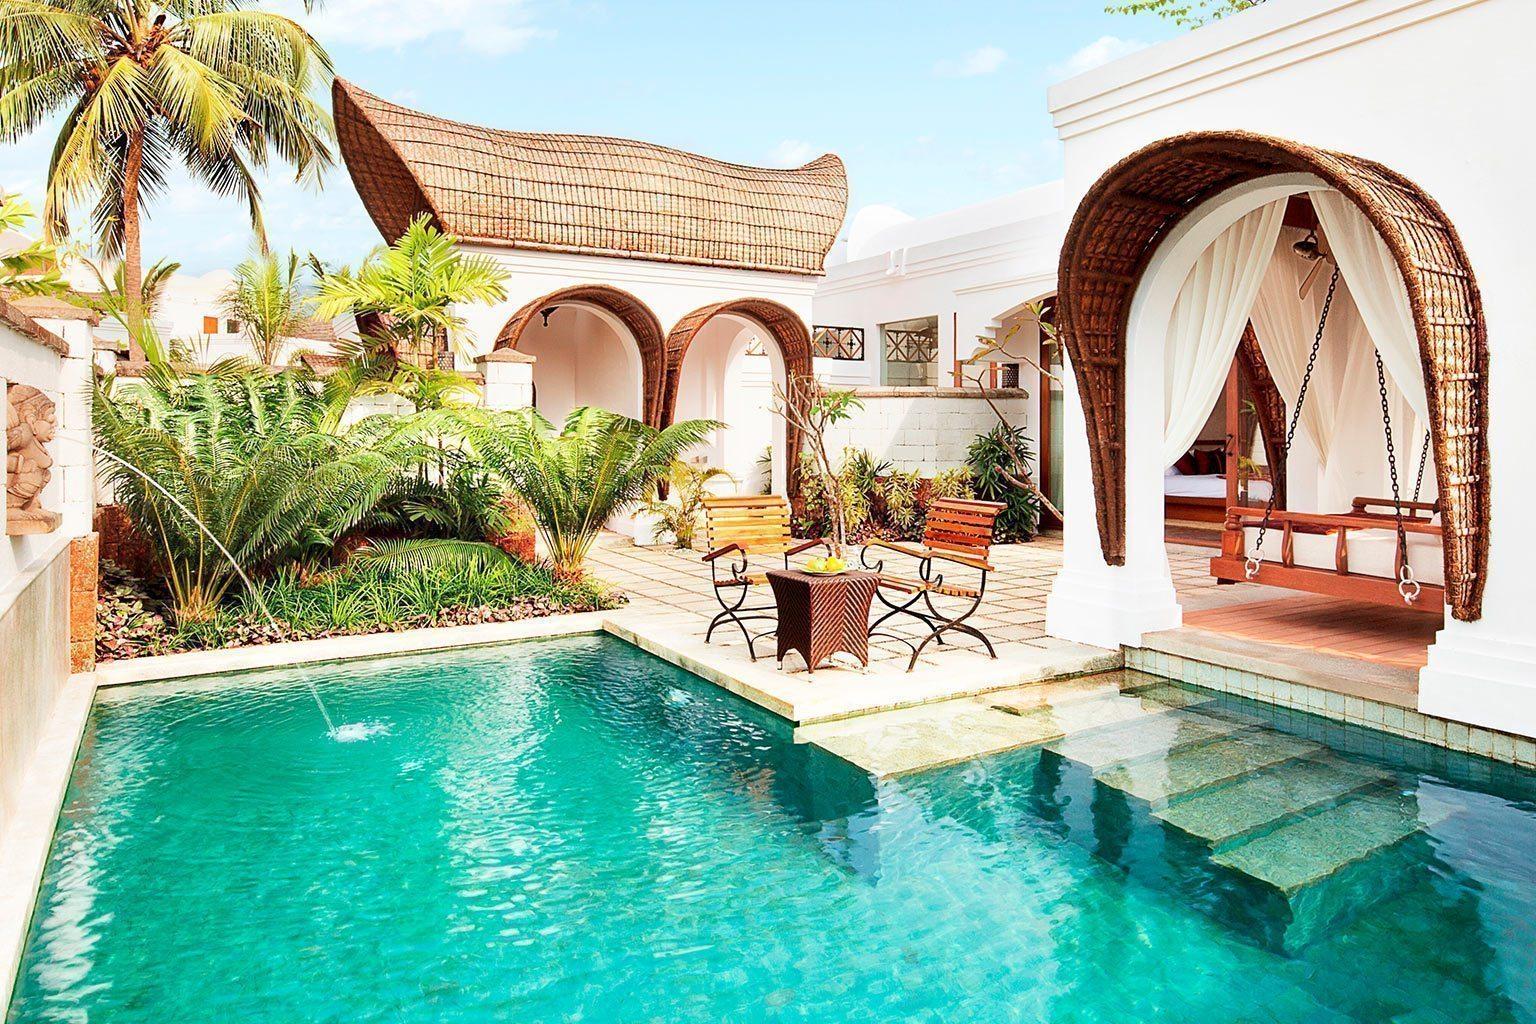 Vivanta by taj bekal kerala in indien designreisen for Pool design in kerala